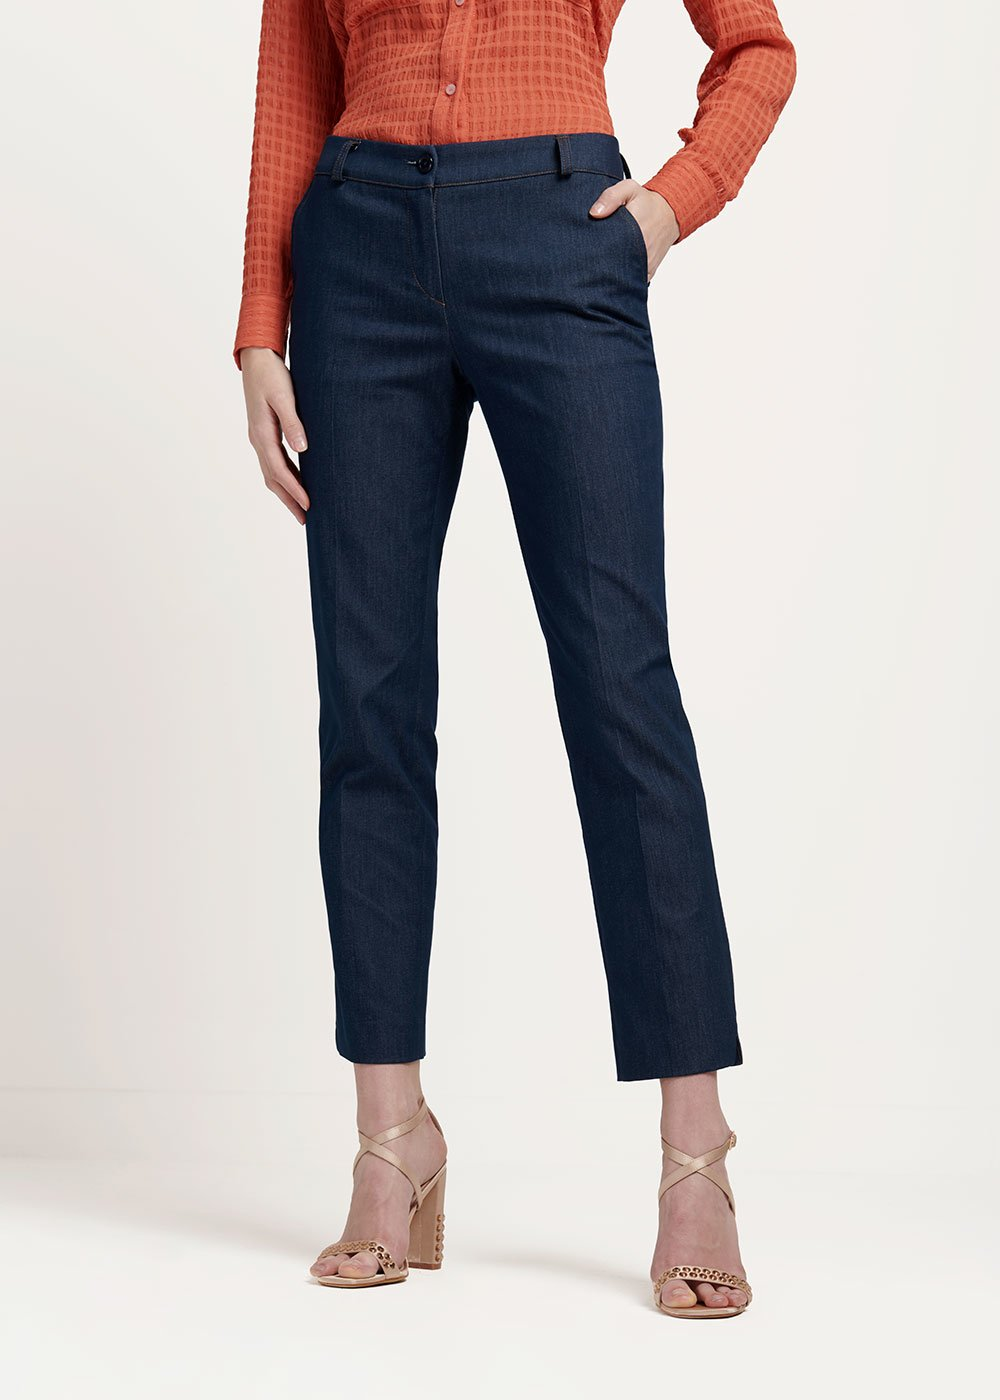 Pantalone modello Alice effetto denim - Dark Denim - Donna